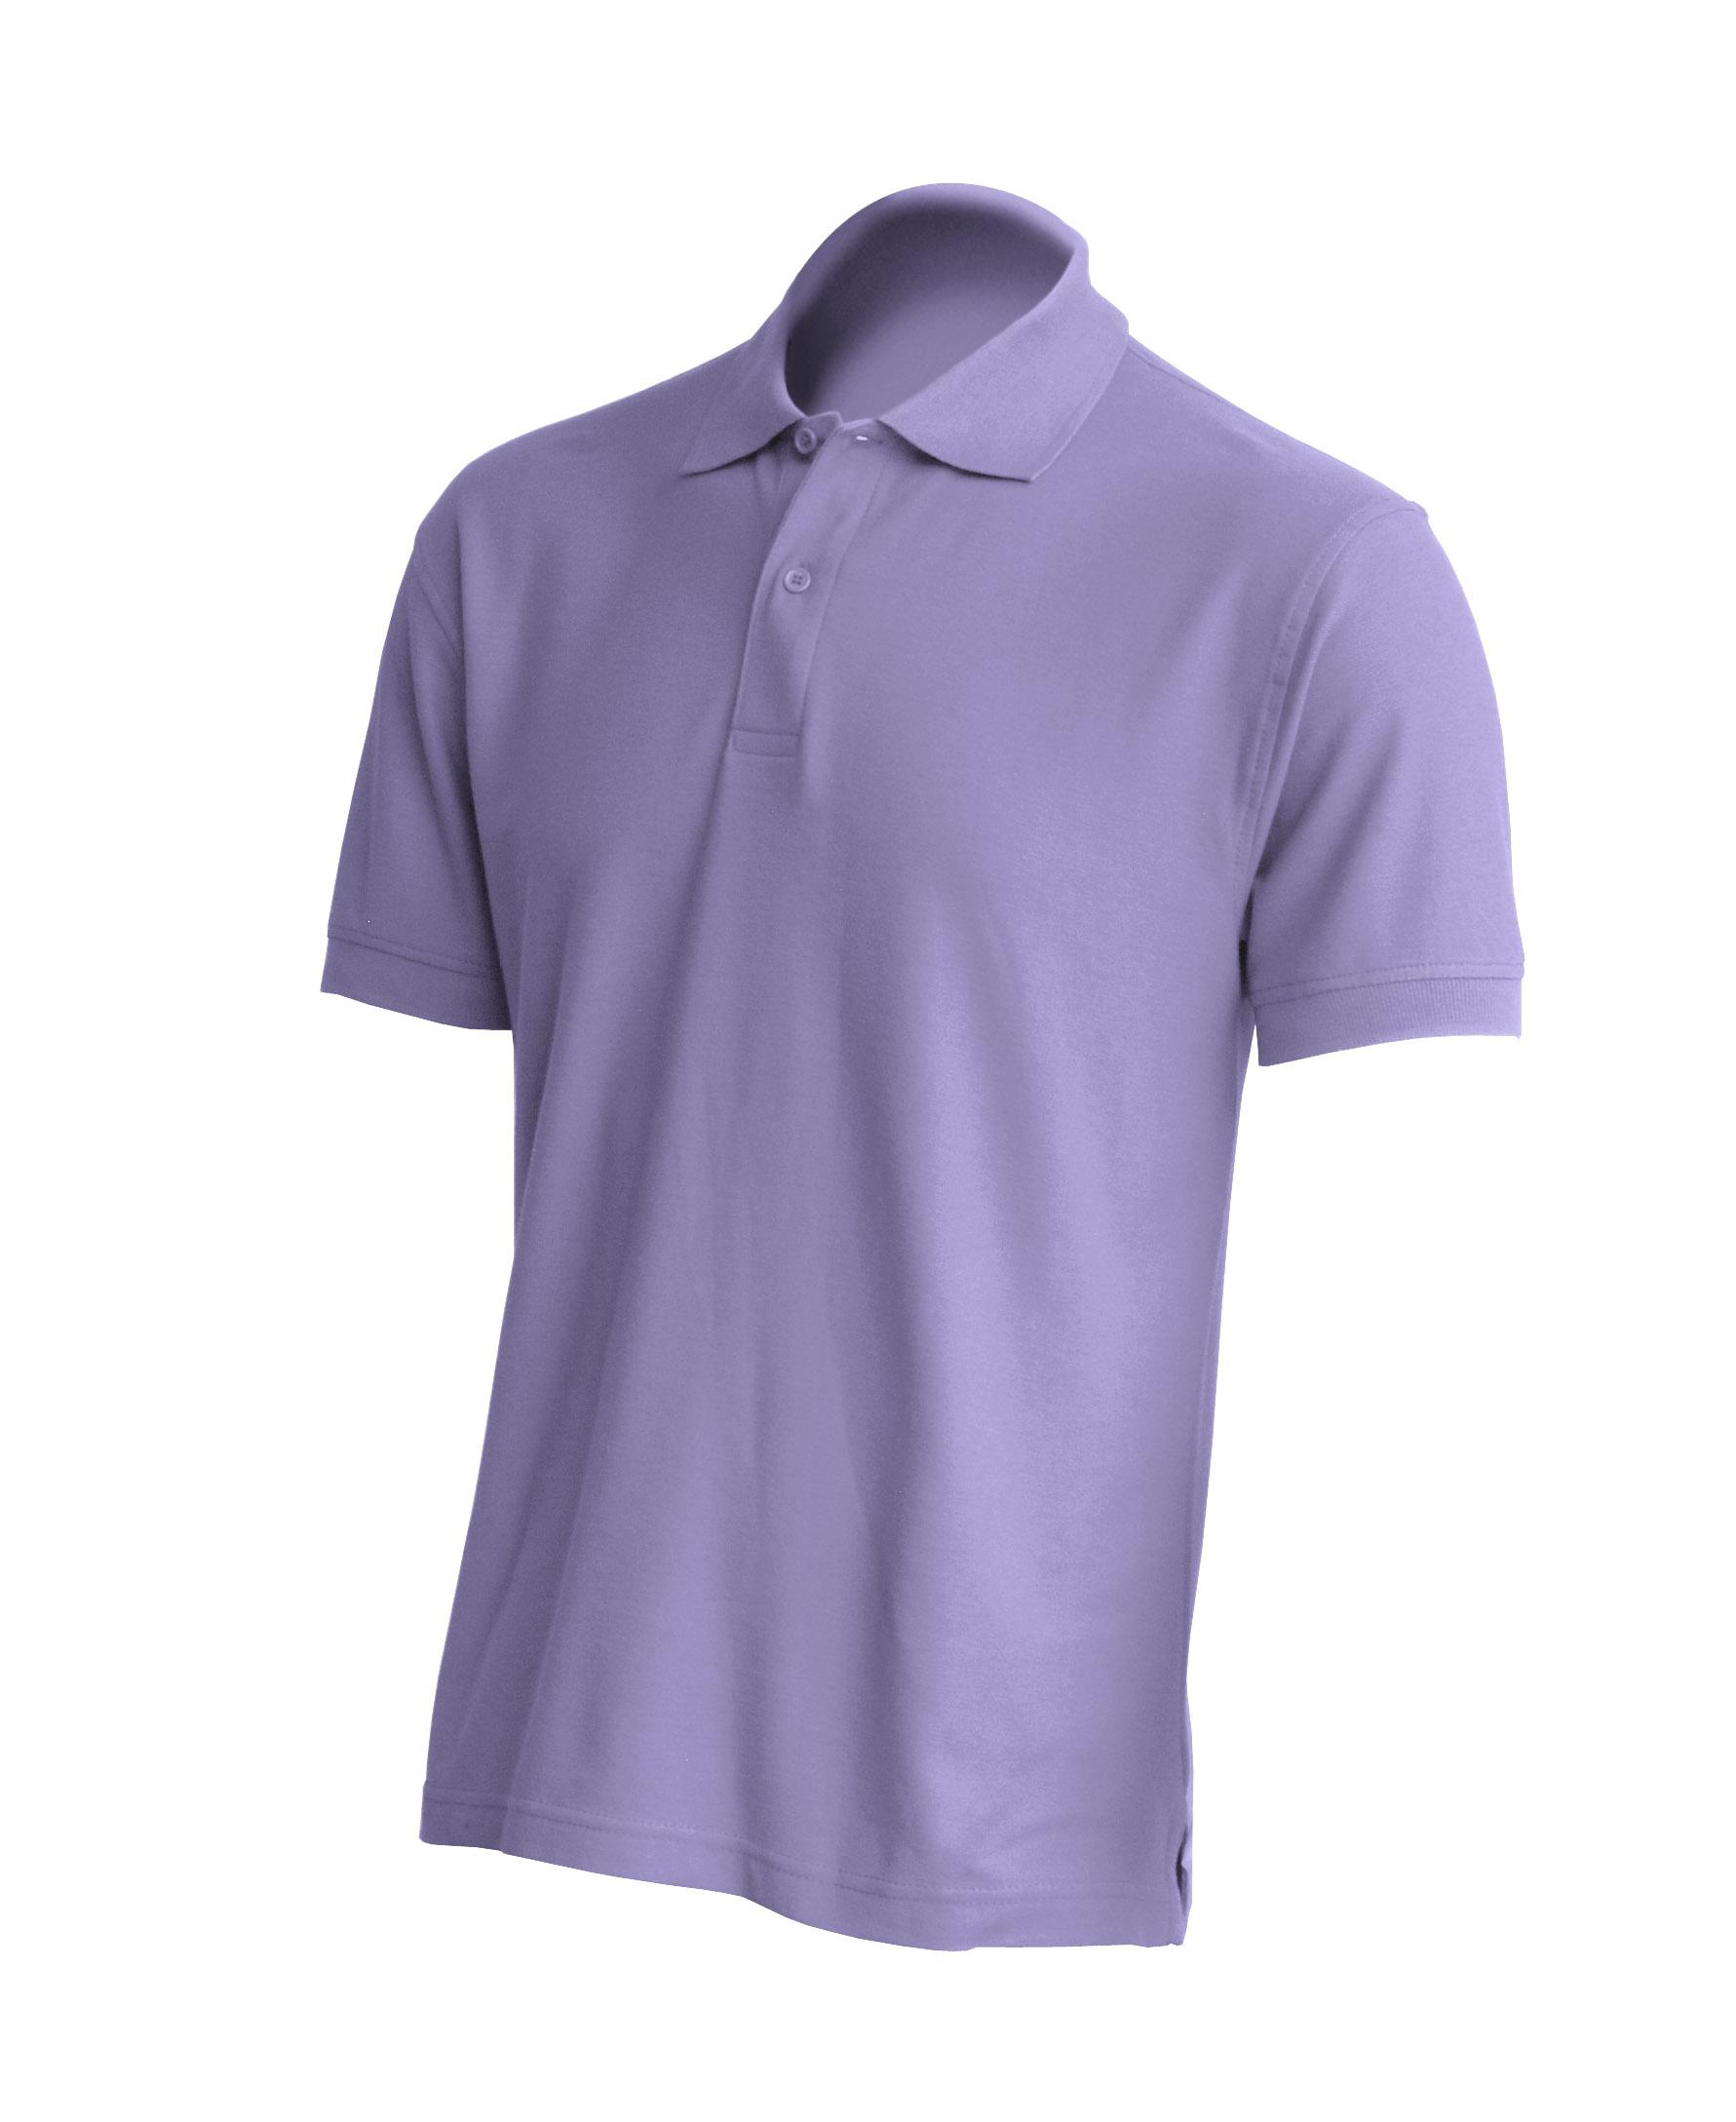 Muška polo majica kratki rukav lavanda